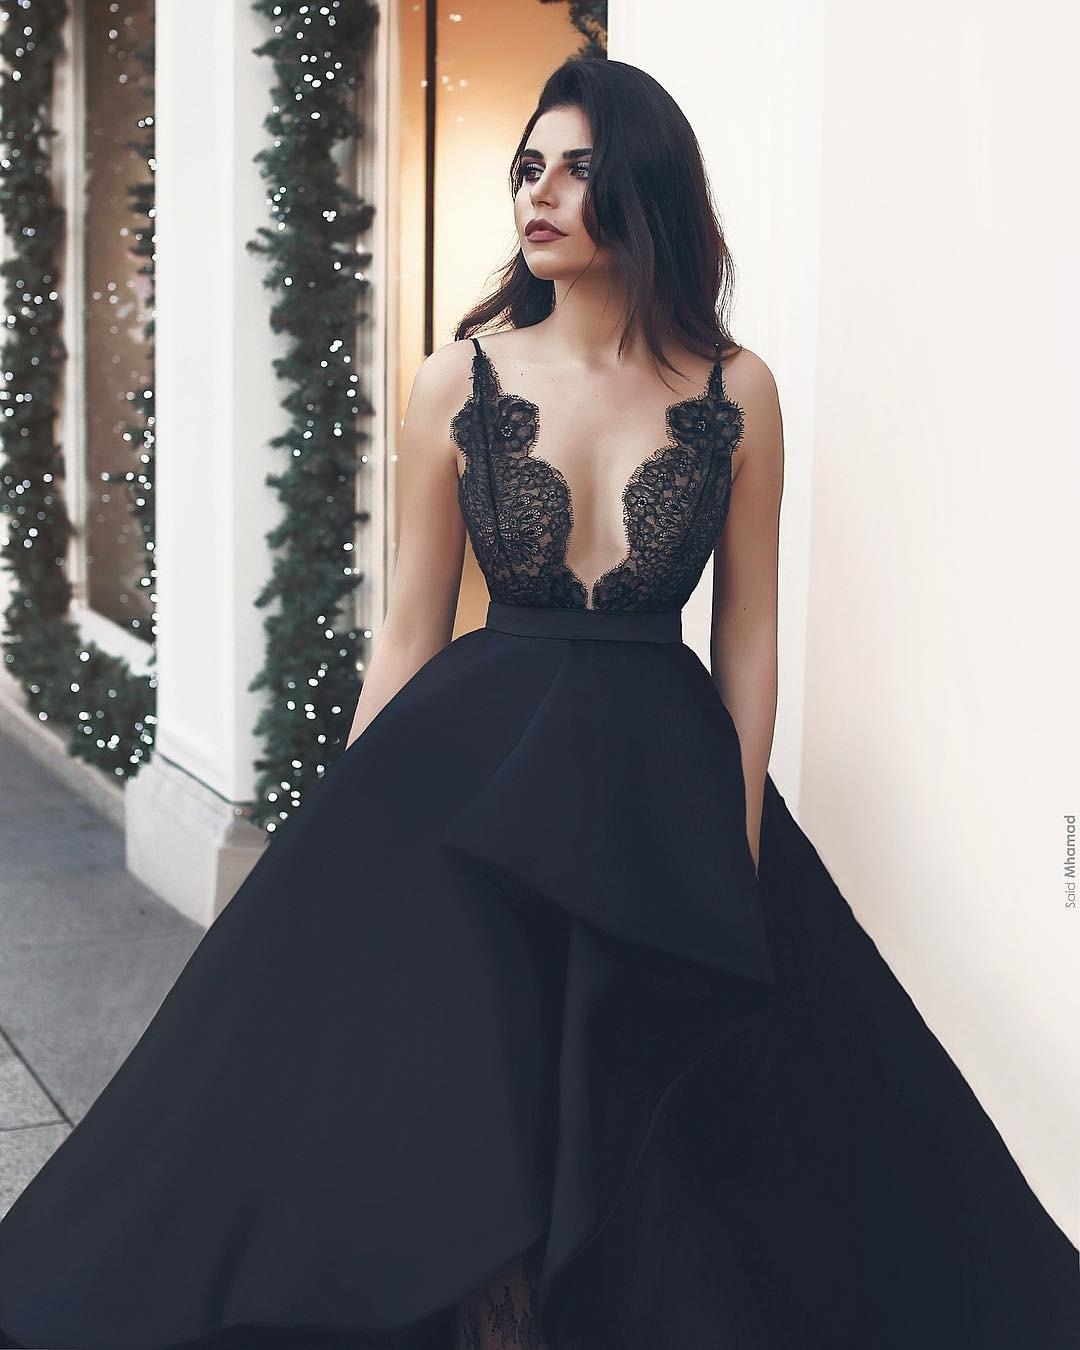 Formal Coolste Abendkleid Lang Schwarz Spitze Boutique15 Einzigartig Abendkleid Lang Schwarz Spitze Boutique